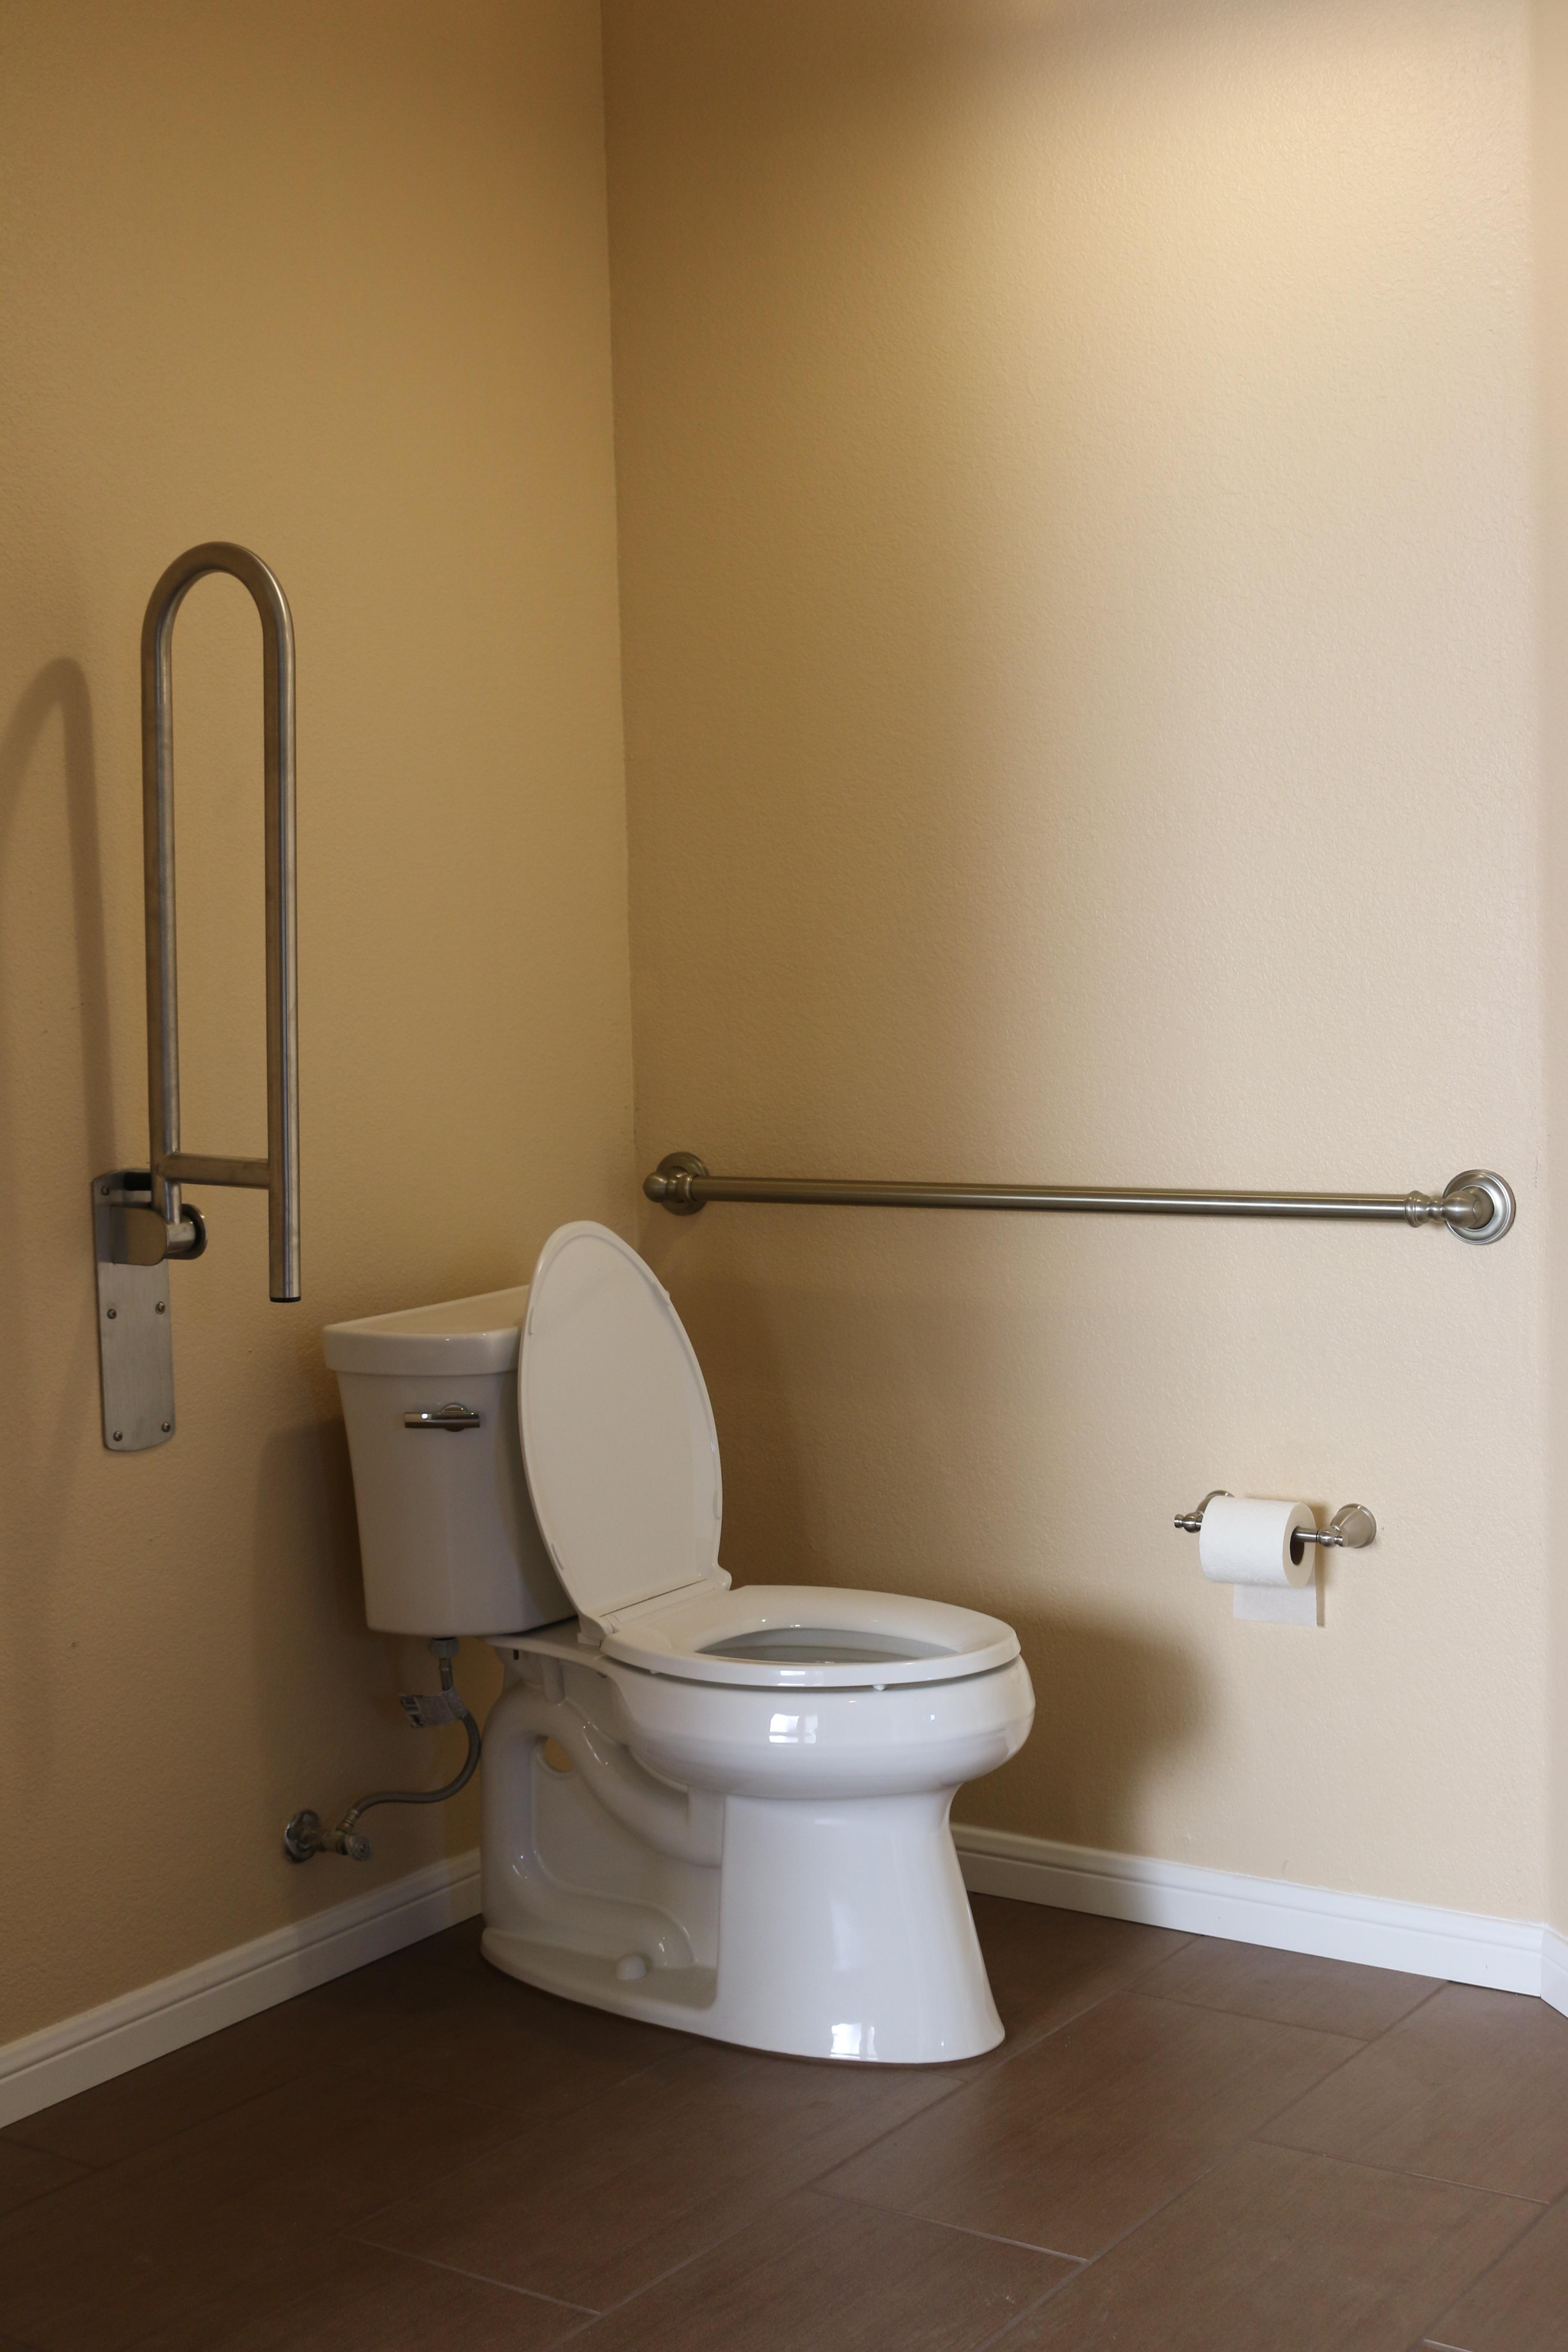 Austin Home Accessibility Help